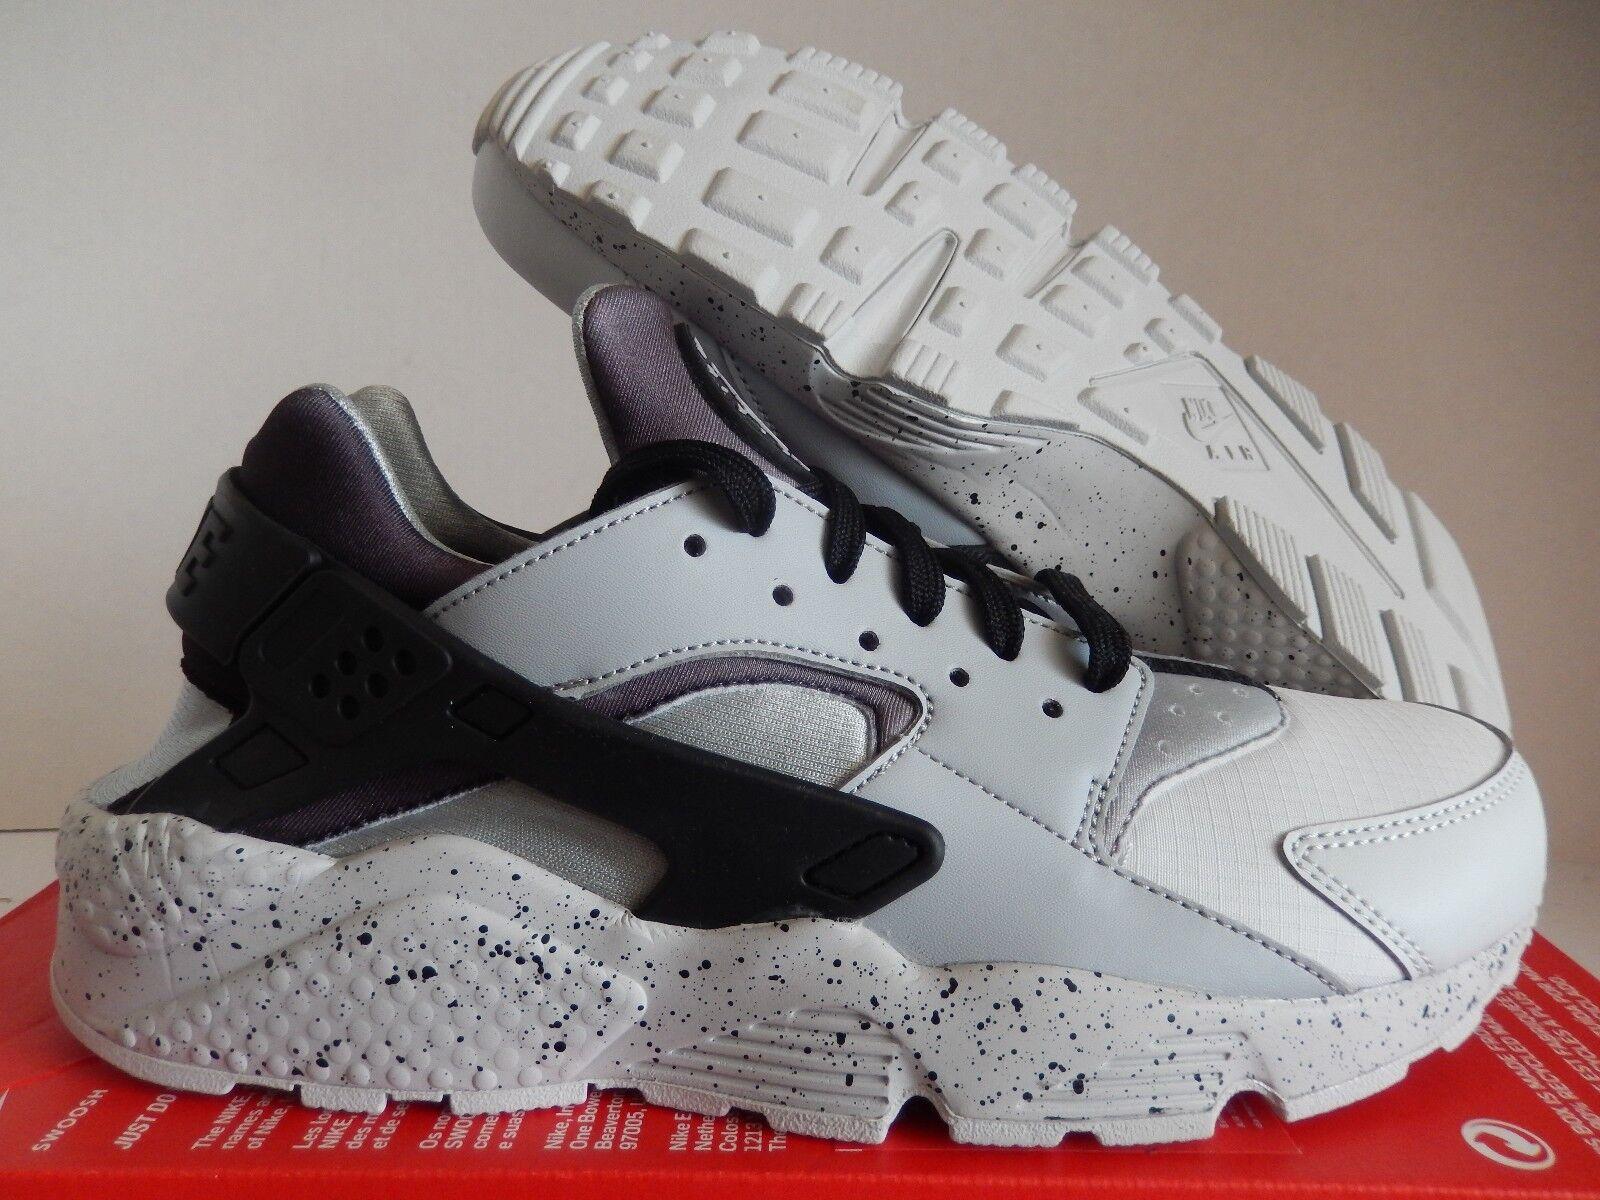 NIKE AIR HUARACHE RUN PRM PREMIUM PURE PLATINUM-BLACK-GREY Price reduction Wild casual shoes